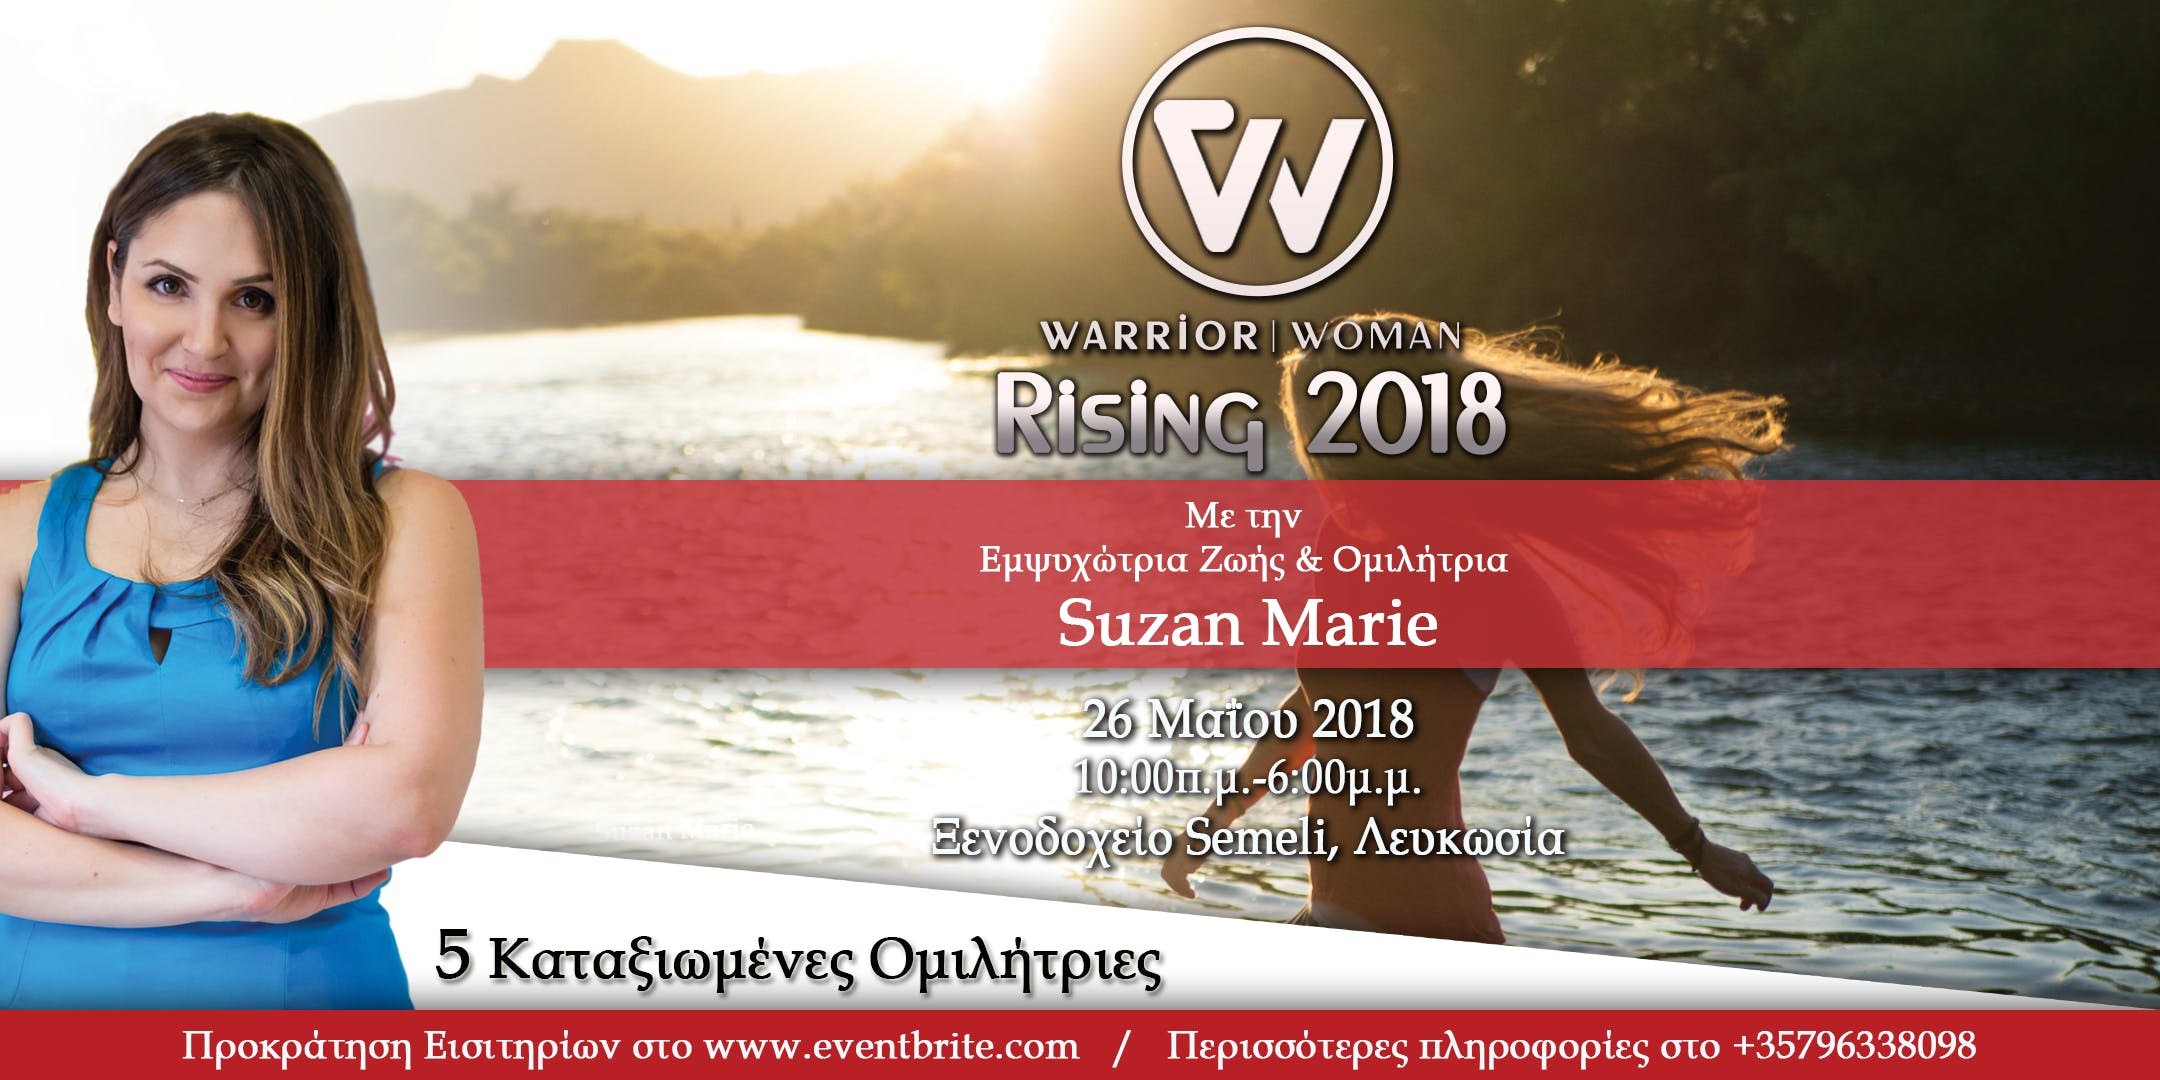 warriorwoman Rising 2018